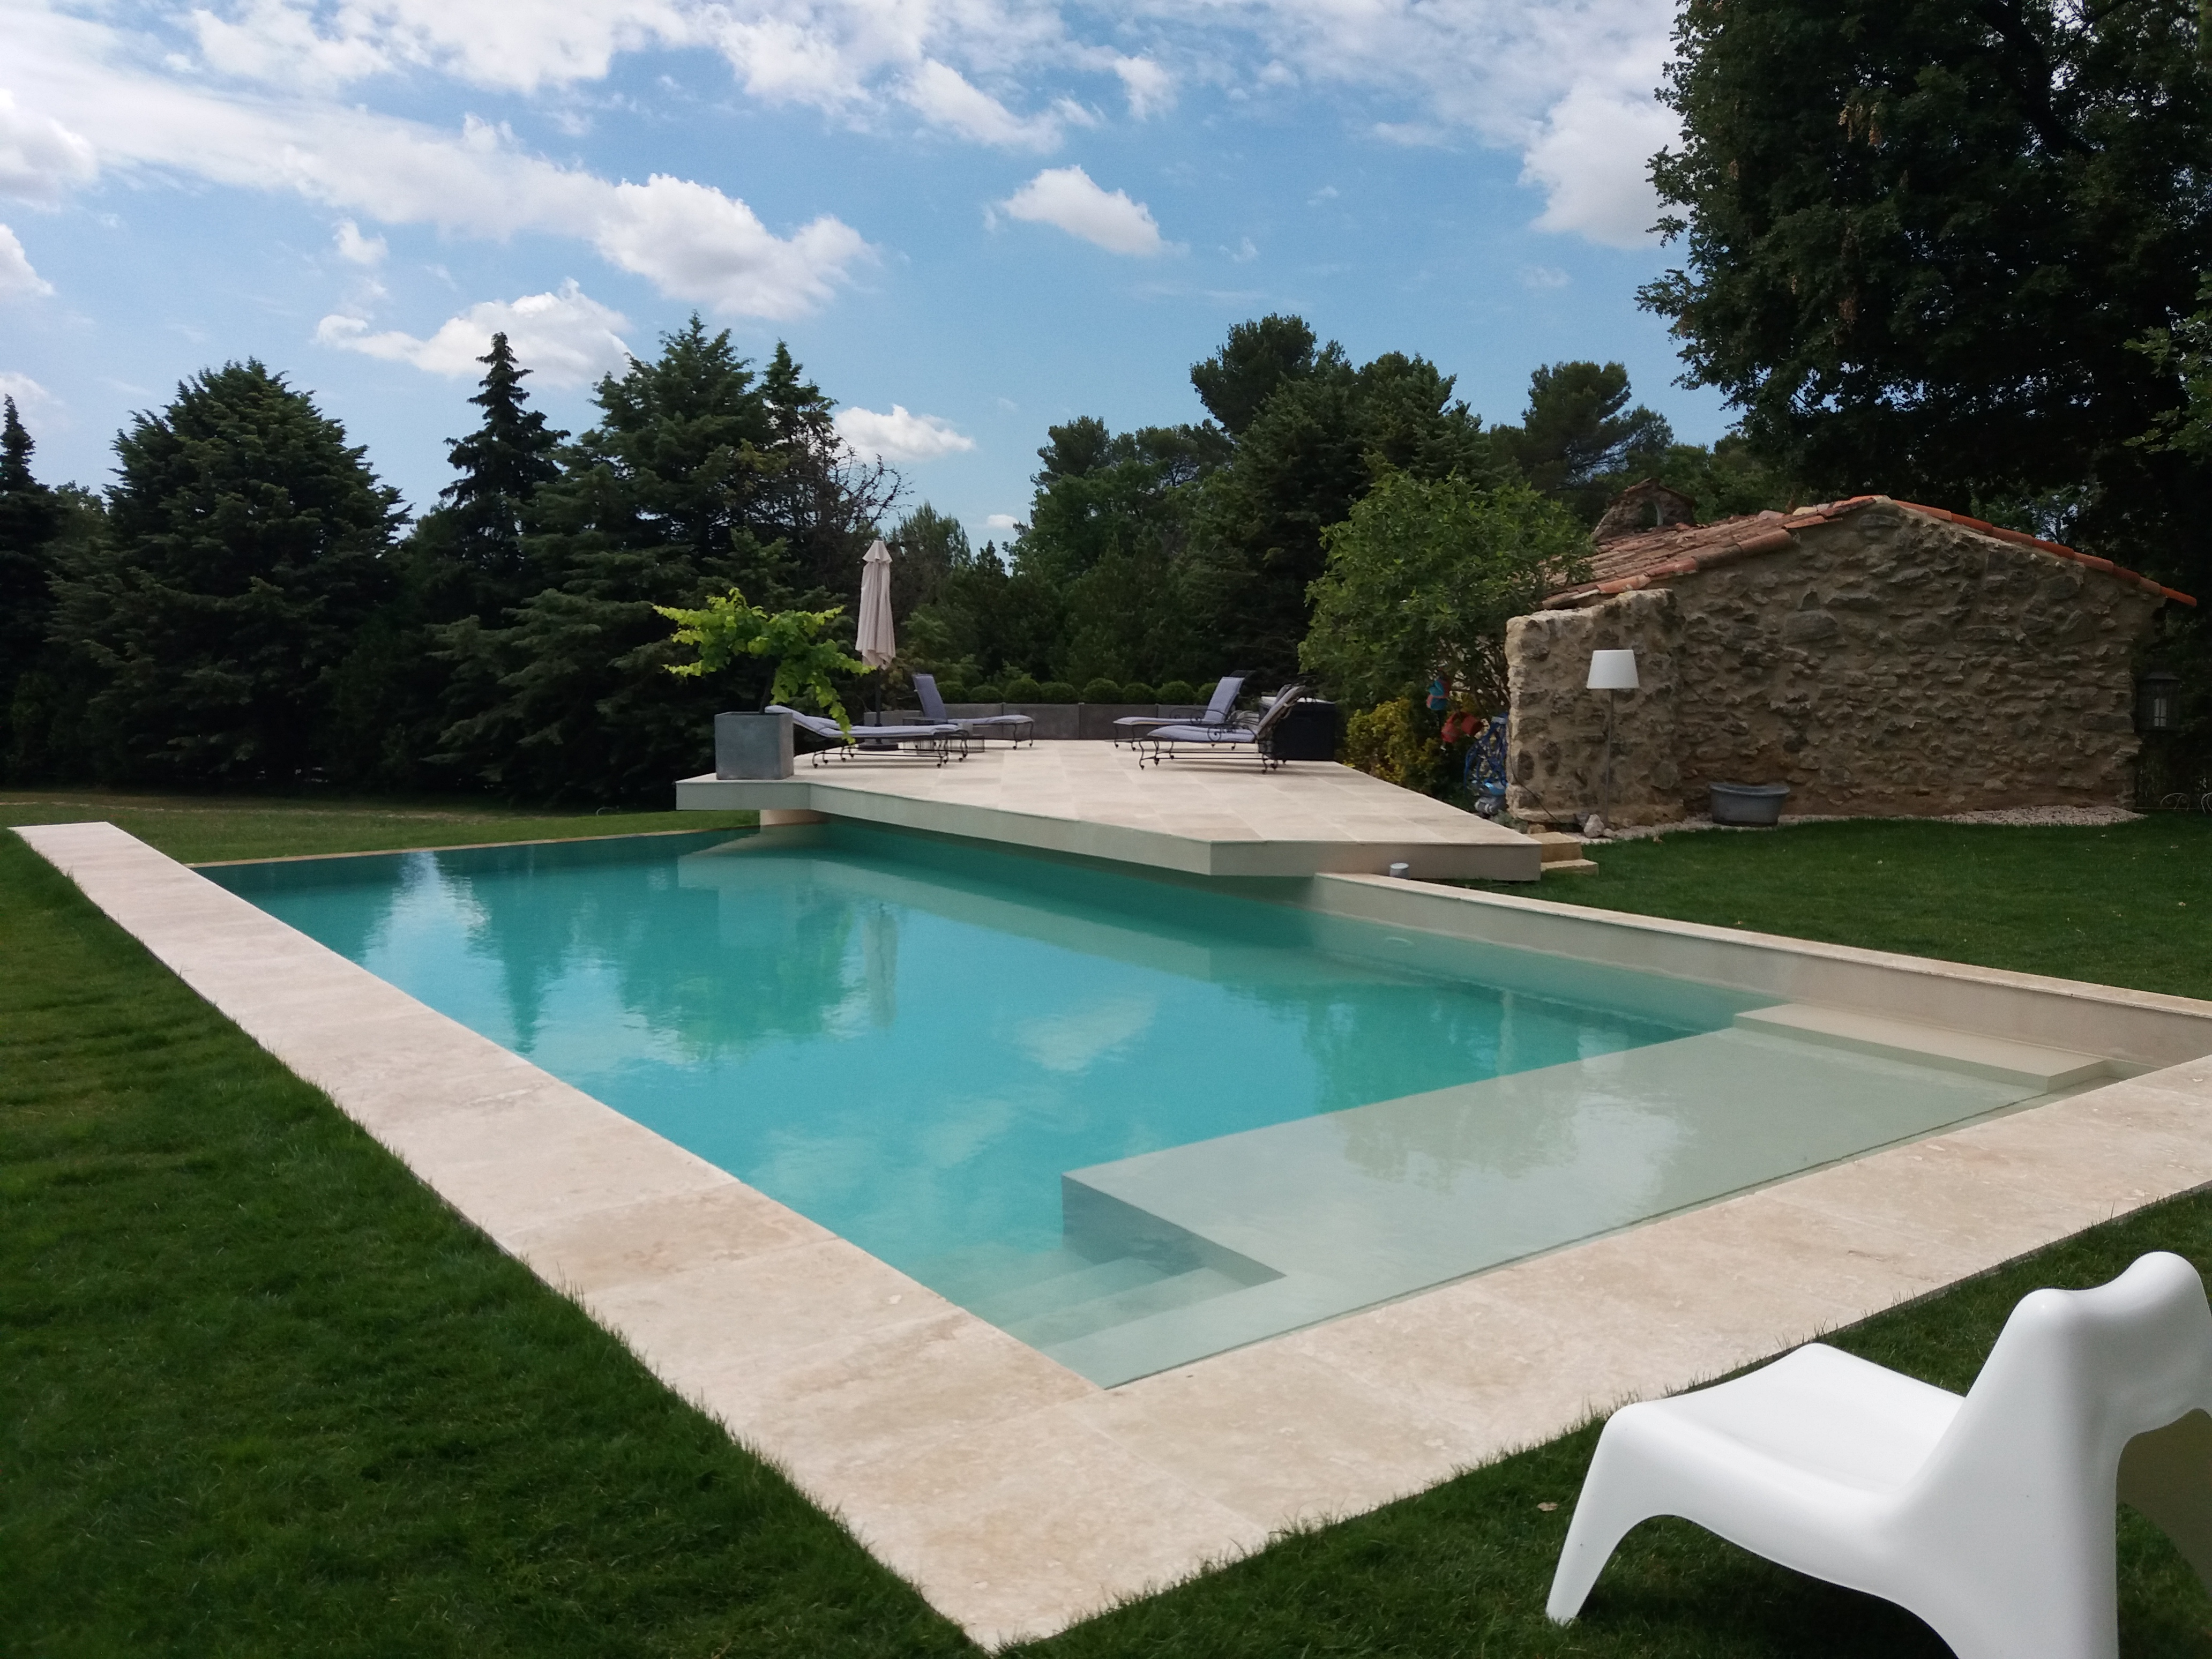 Pvc arm piscine le site du liner pvc arm piscine for Piscine 3 66x1 22